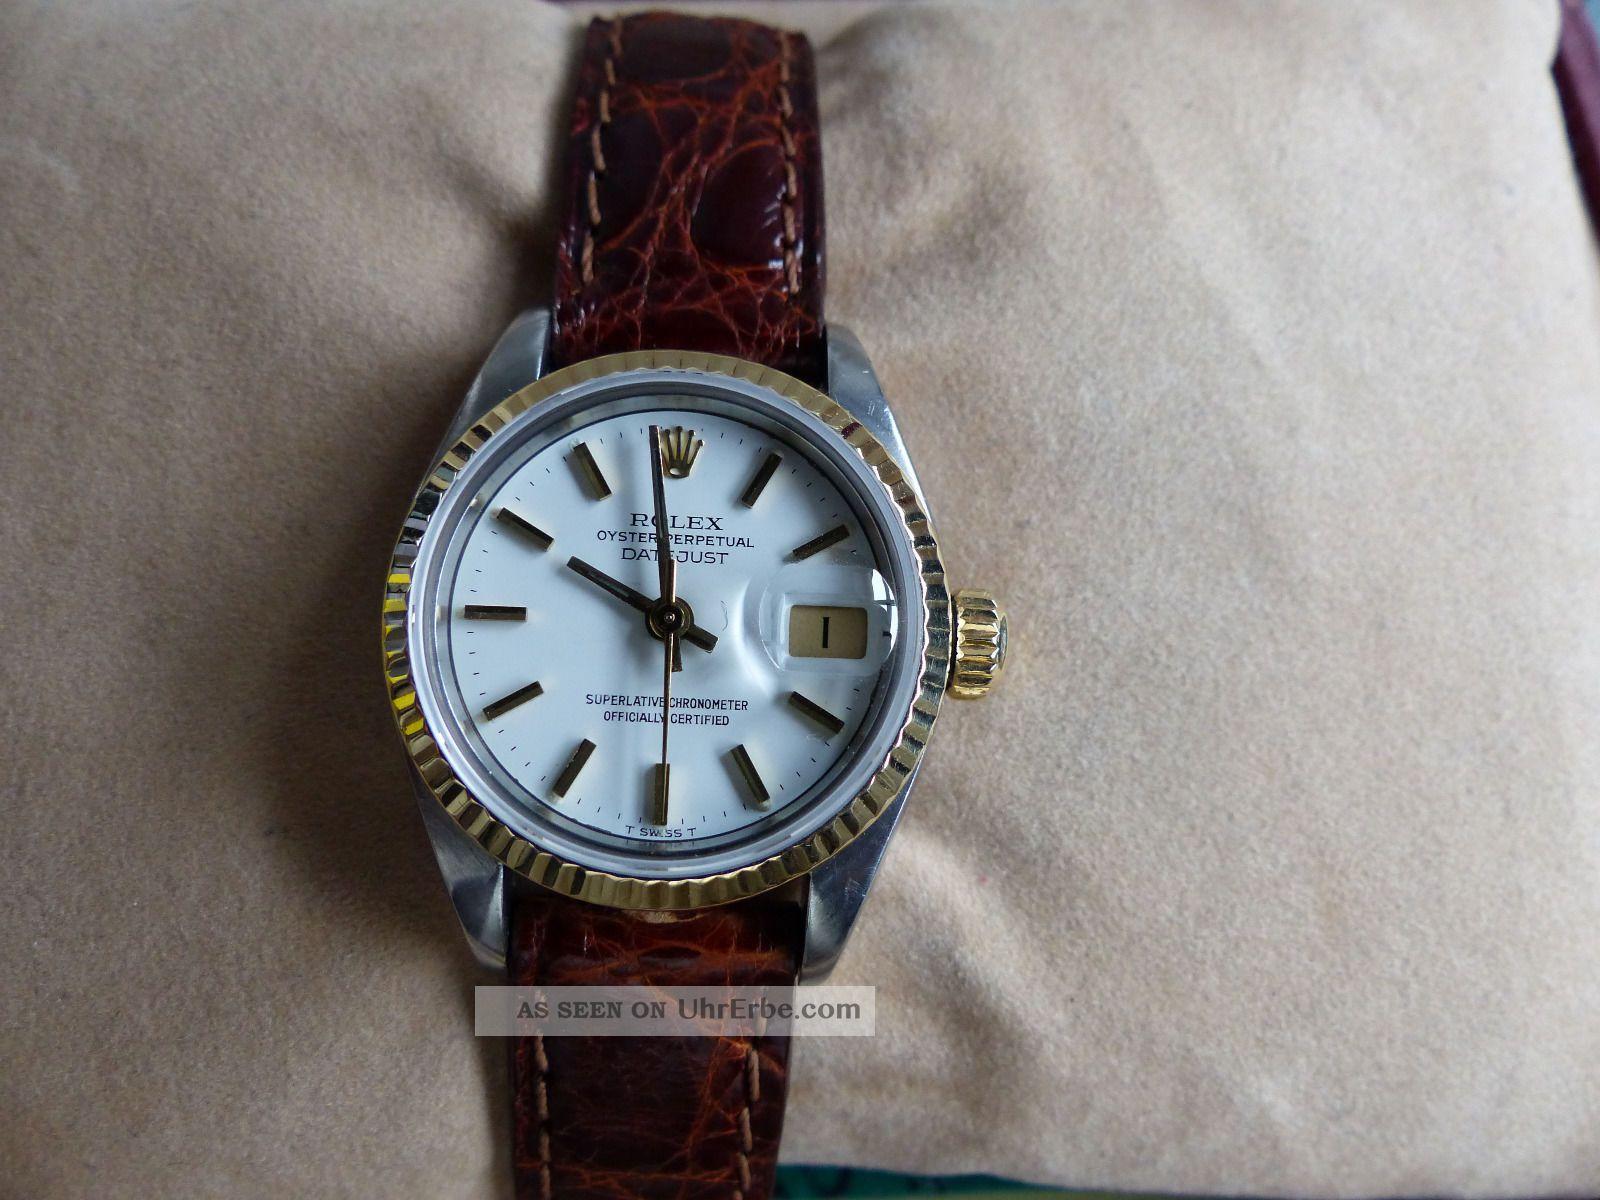 Rolex Lady Datejust Gold / Stahl,  Ref 69173,  Box,  Papiere,  Lc 100 Armbanduhren Bild